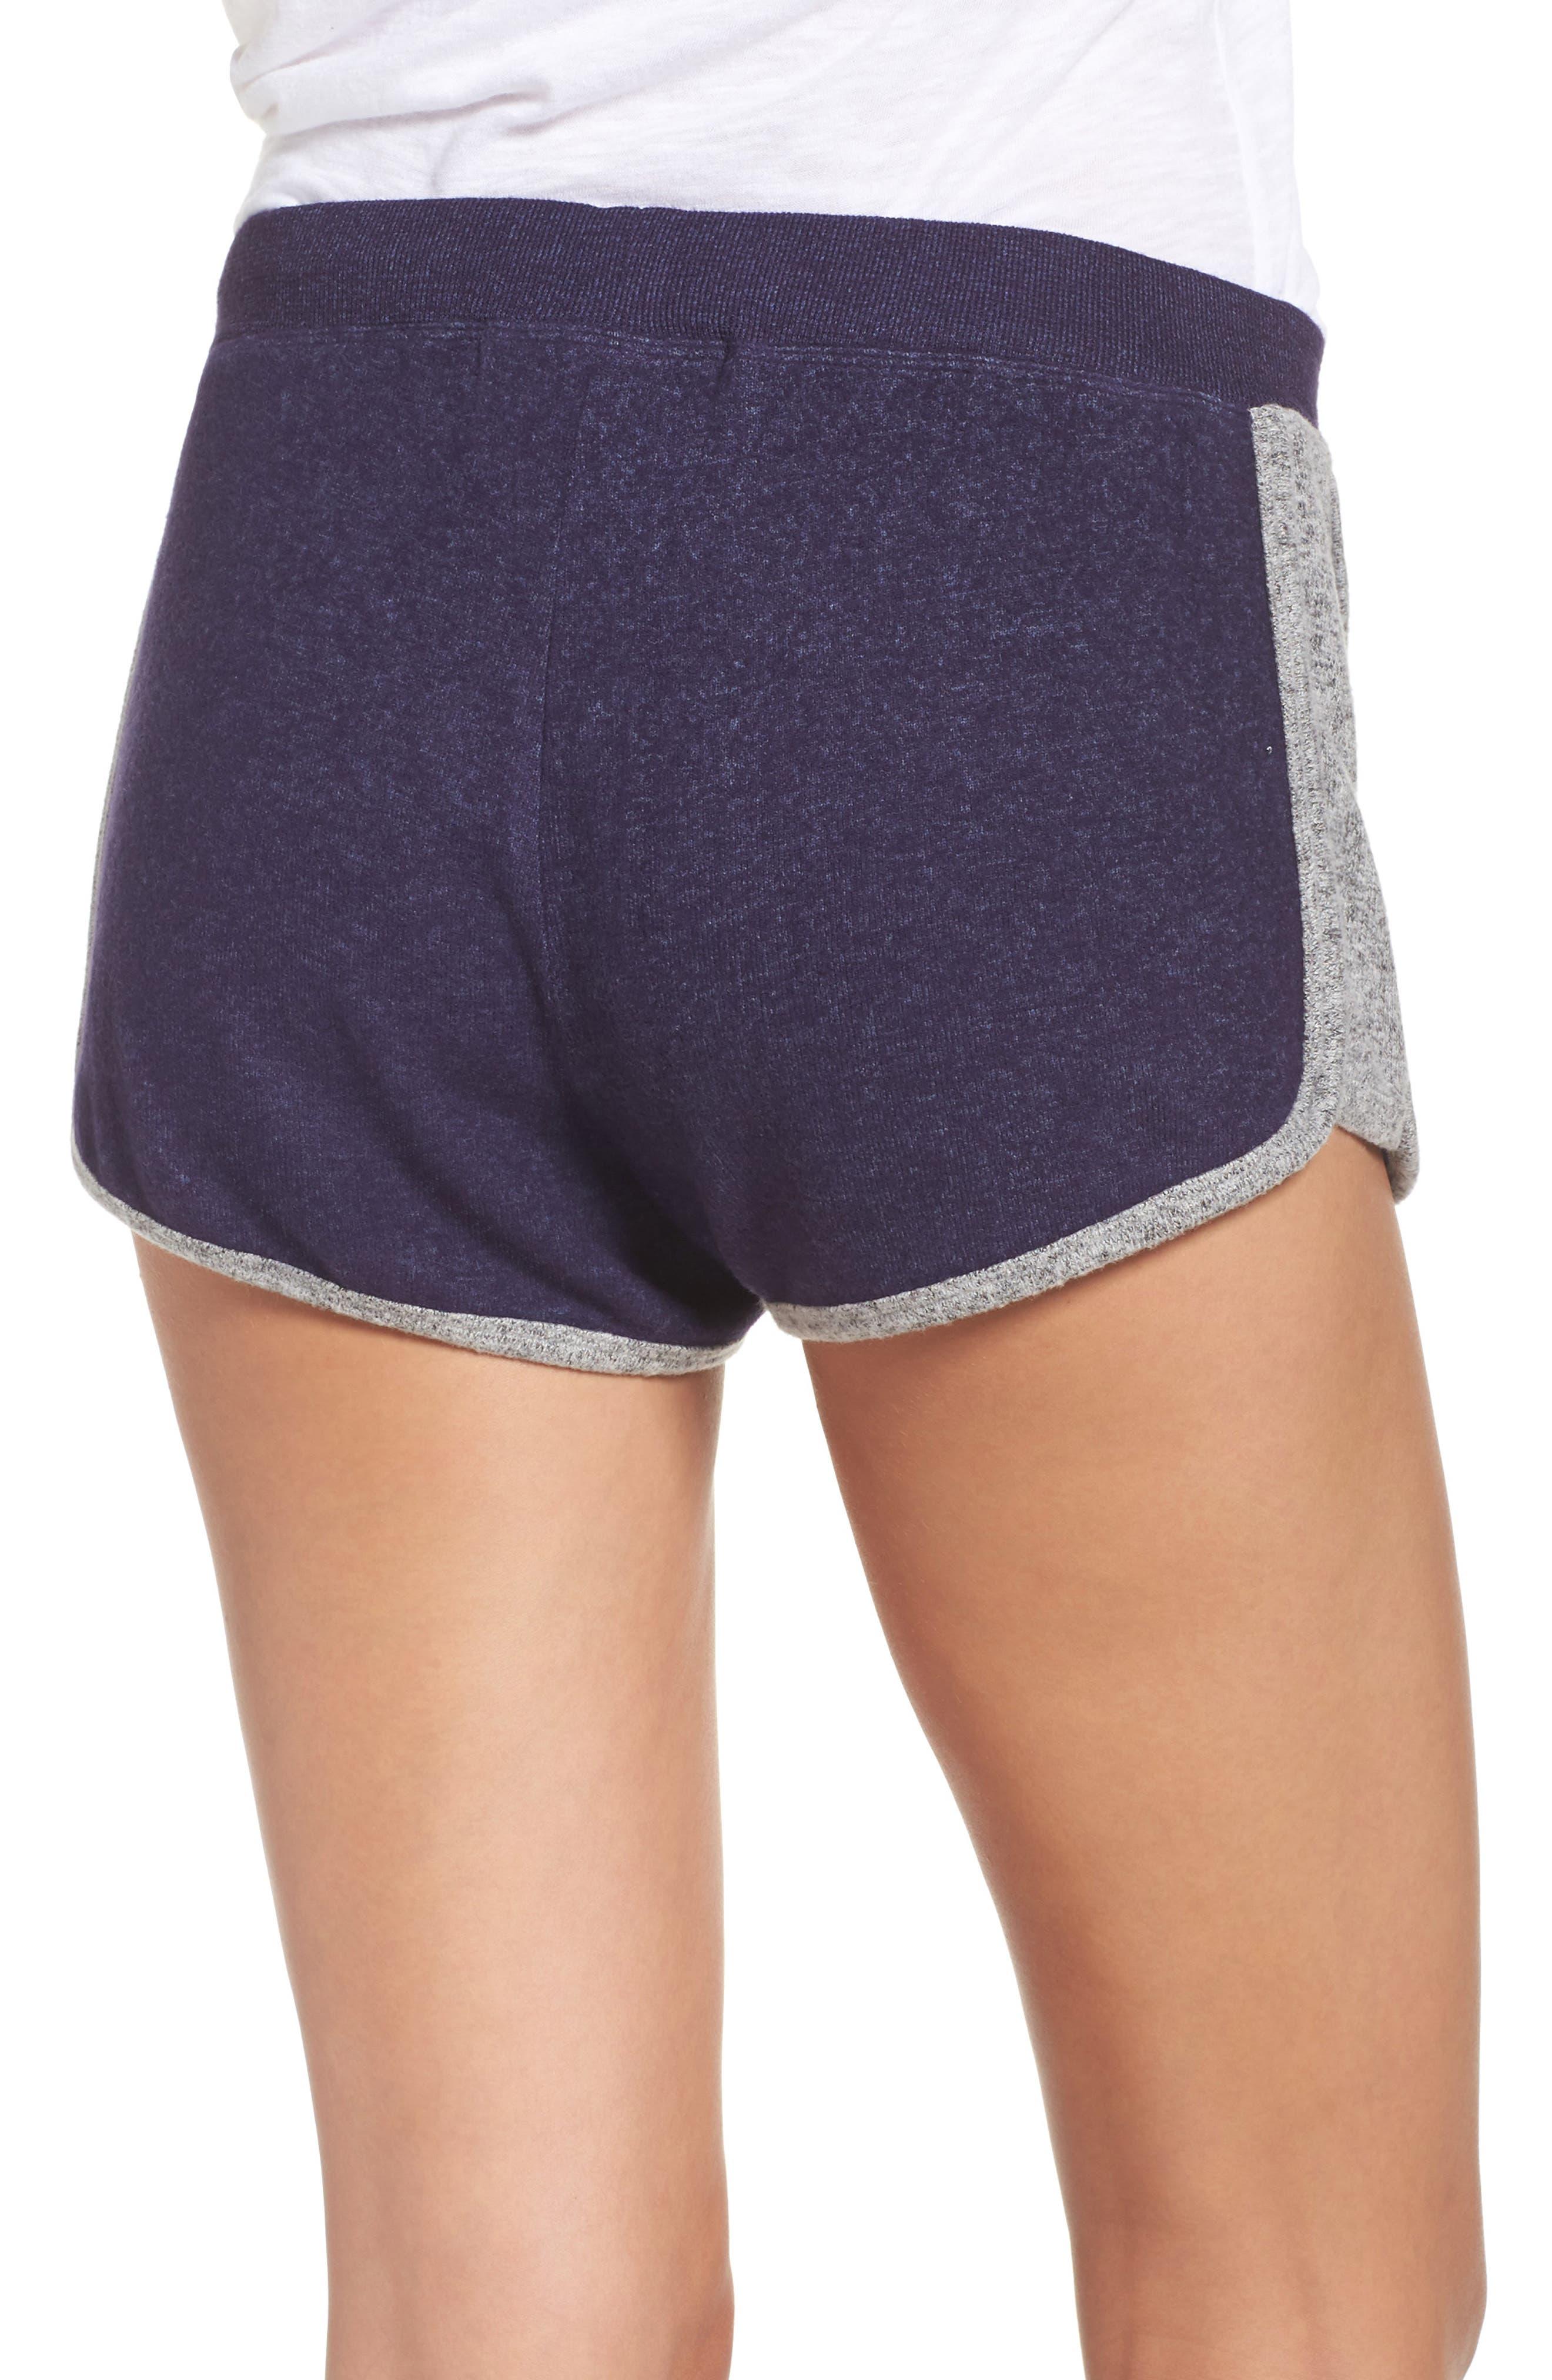 Alternate Image 2  - Make + Model Bring It On Lounge Shorts